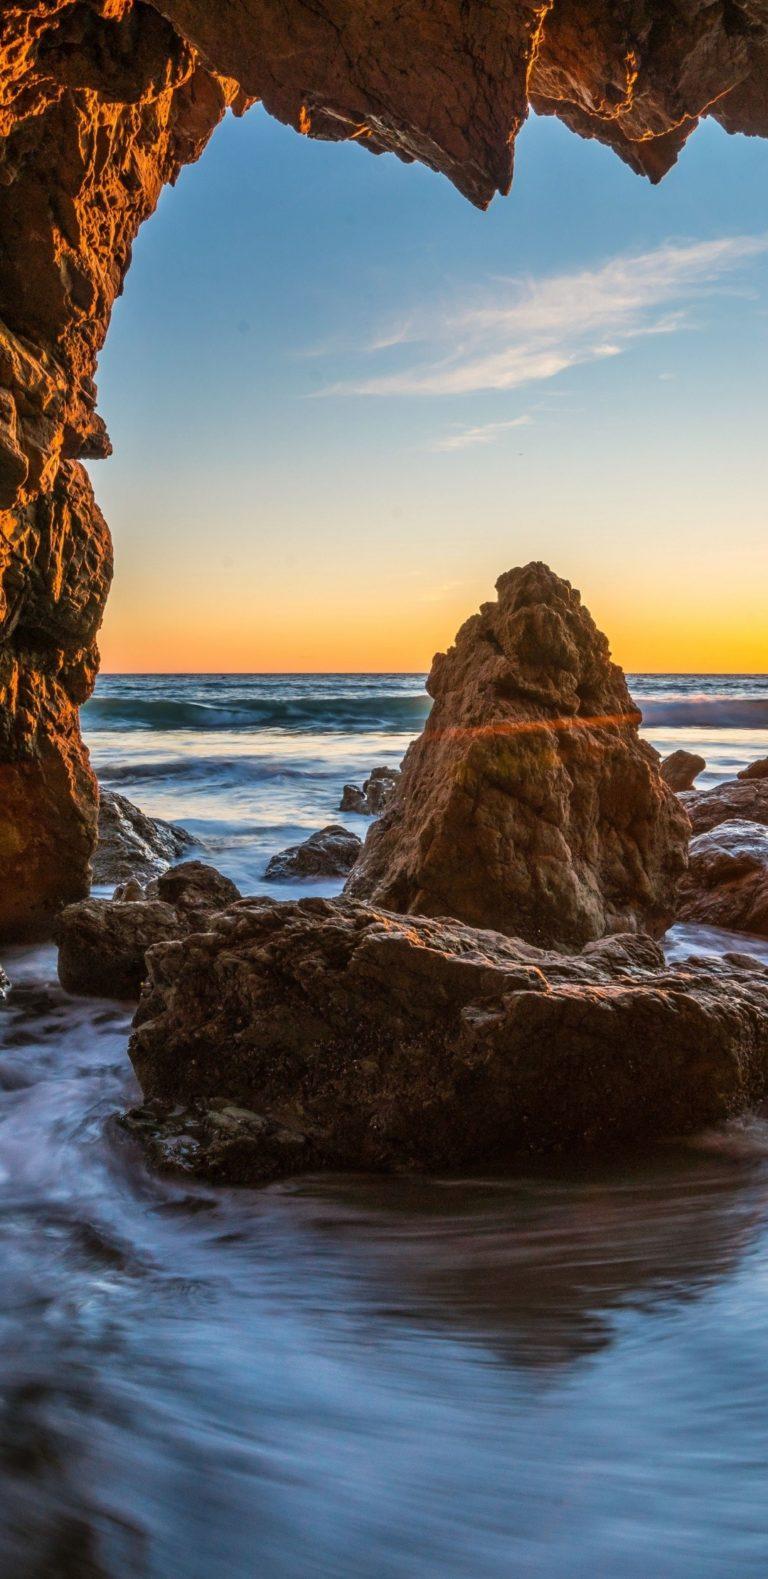 Ocean Sunrises And Sunsets USA 1080x2220 768x1579